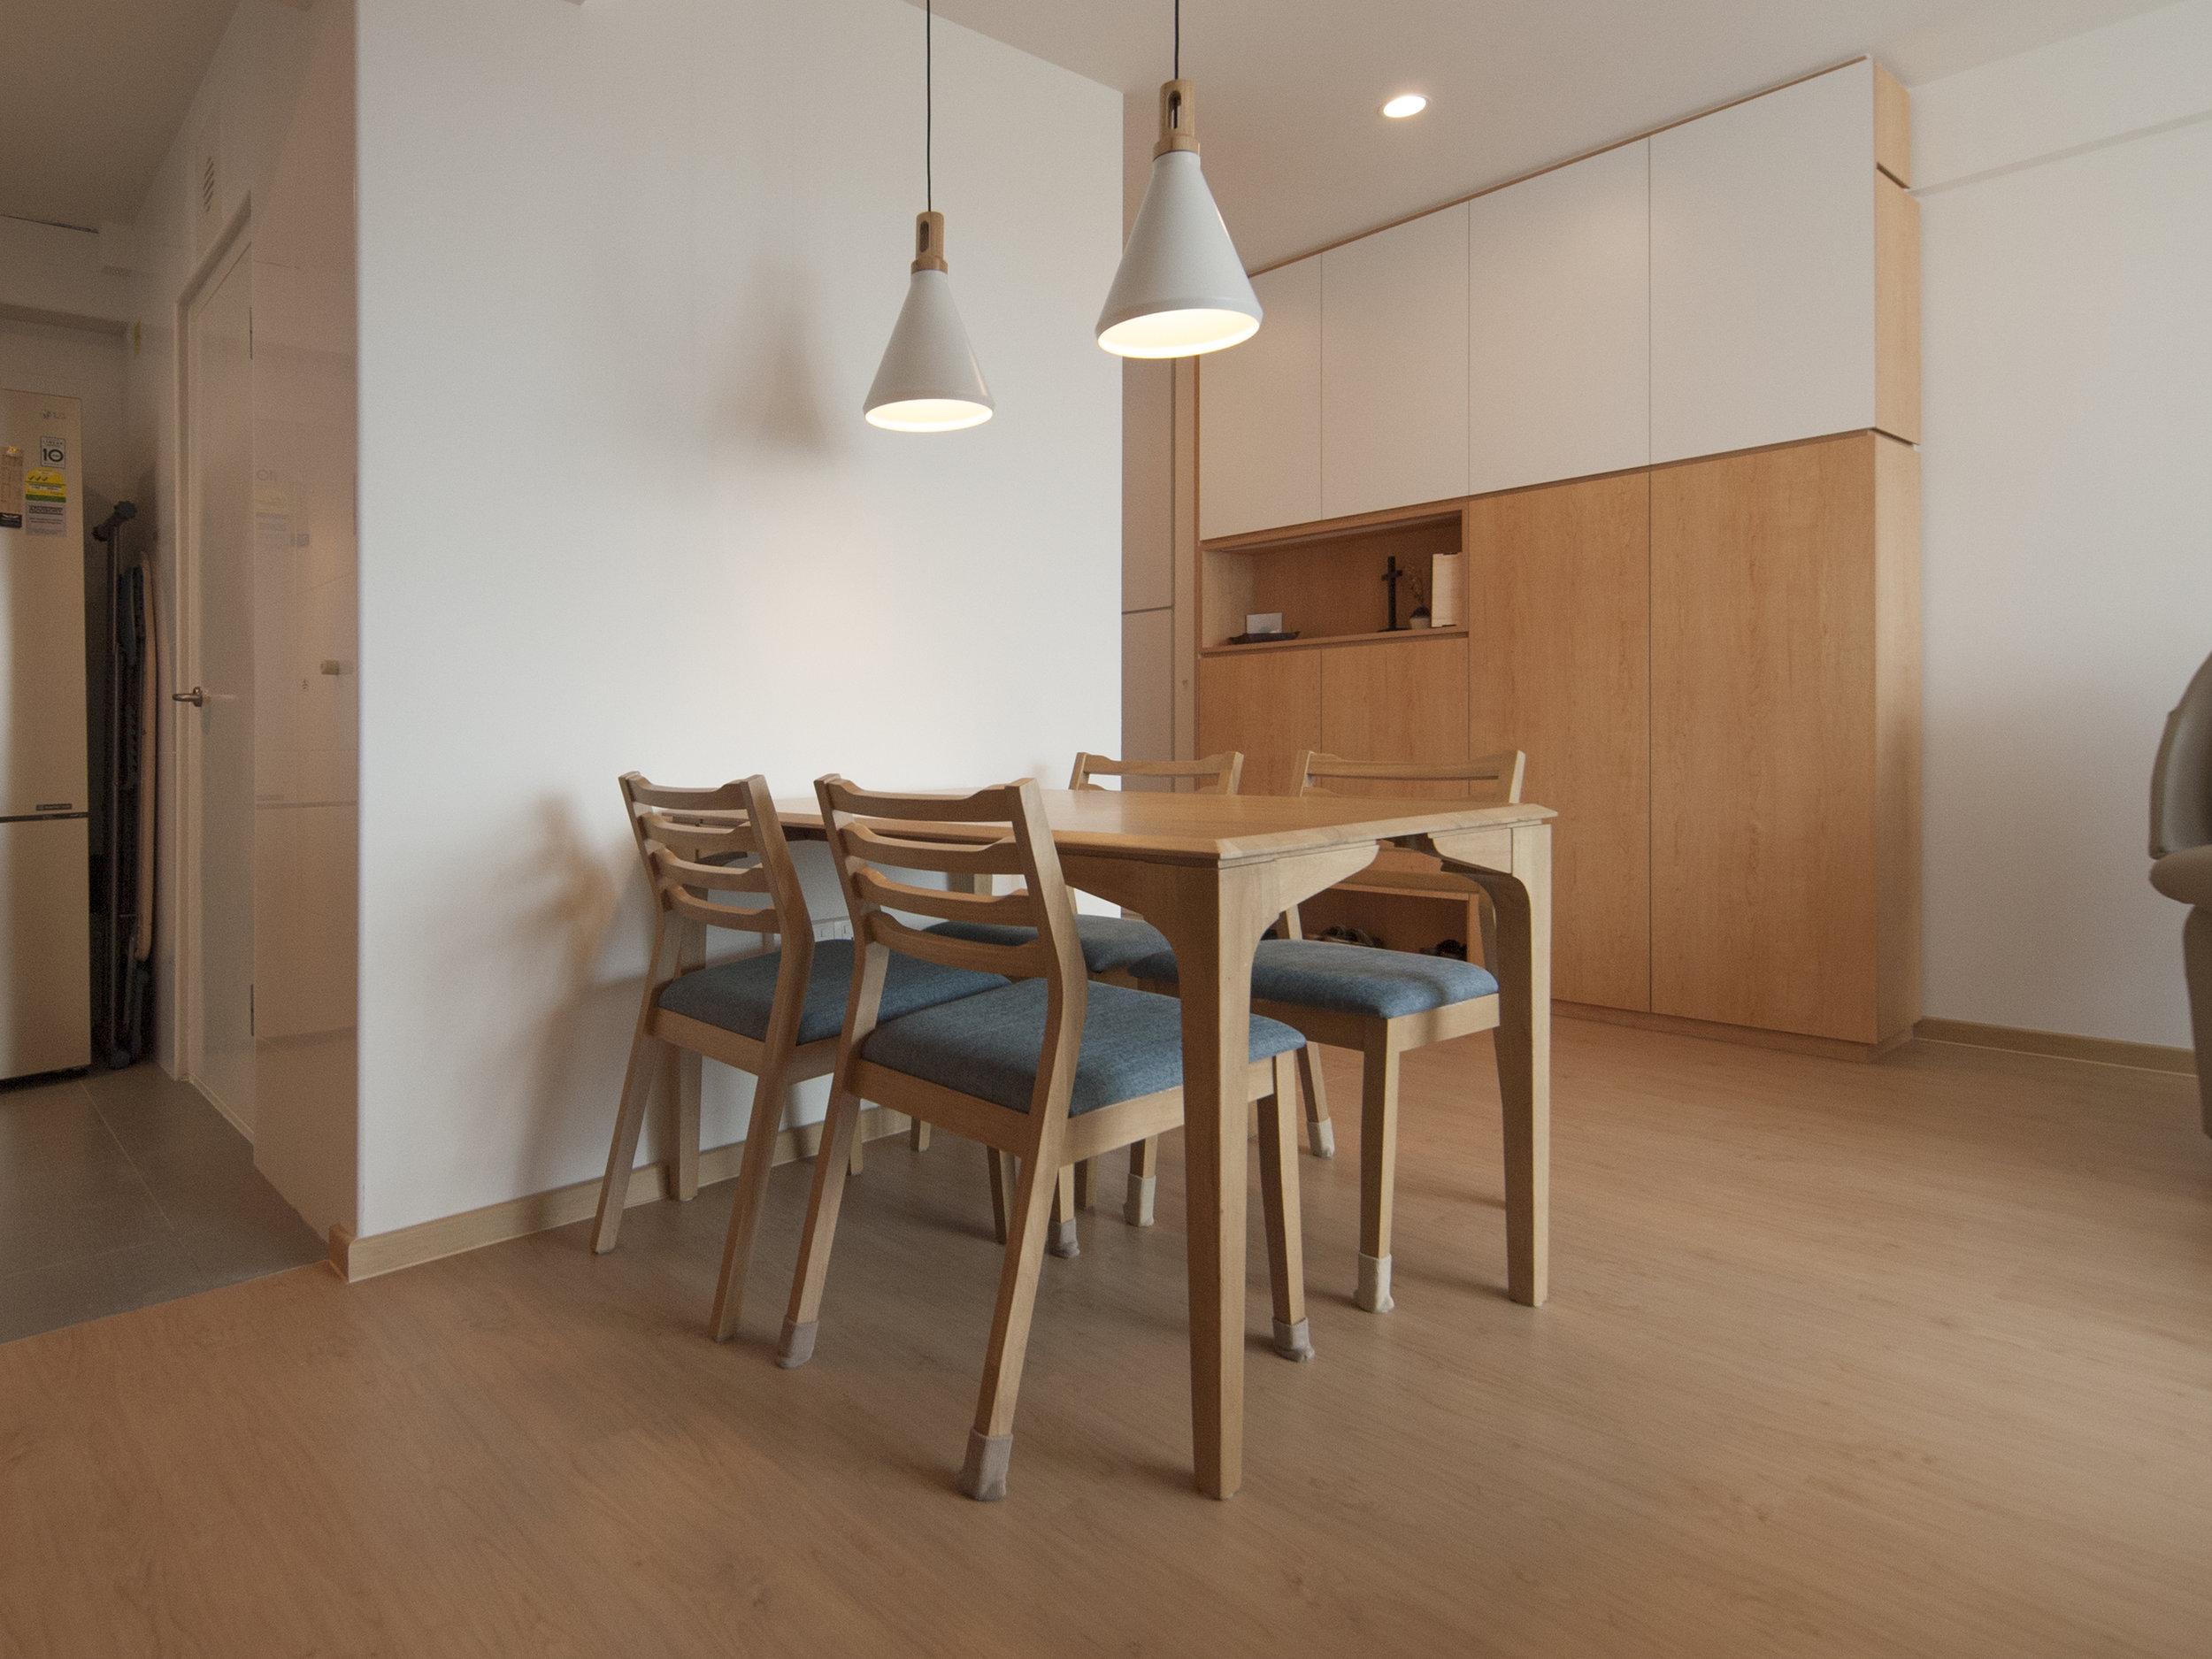 Dining Room & Entryway